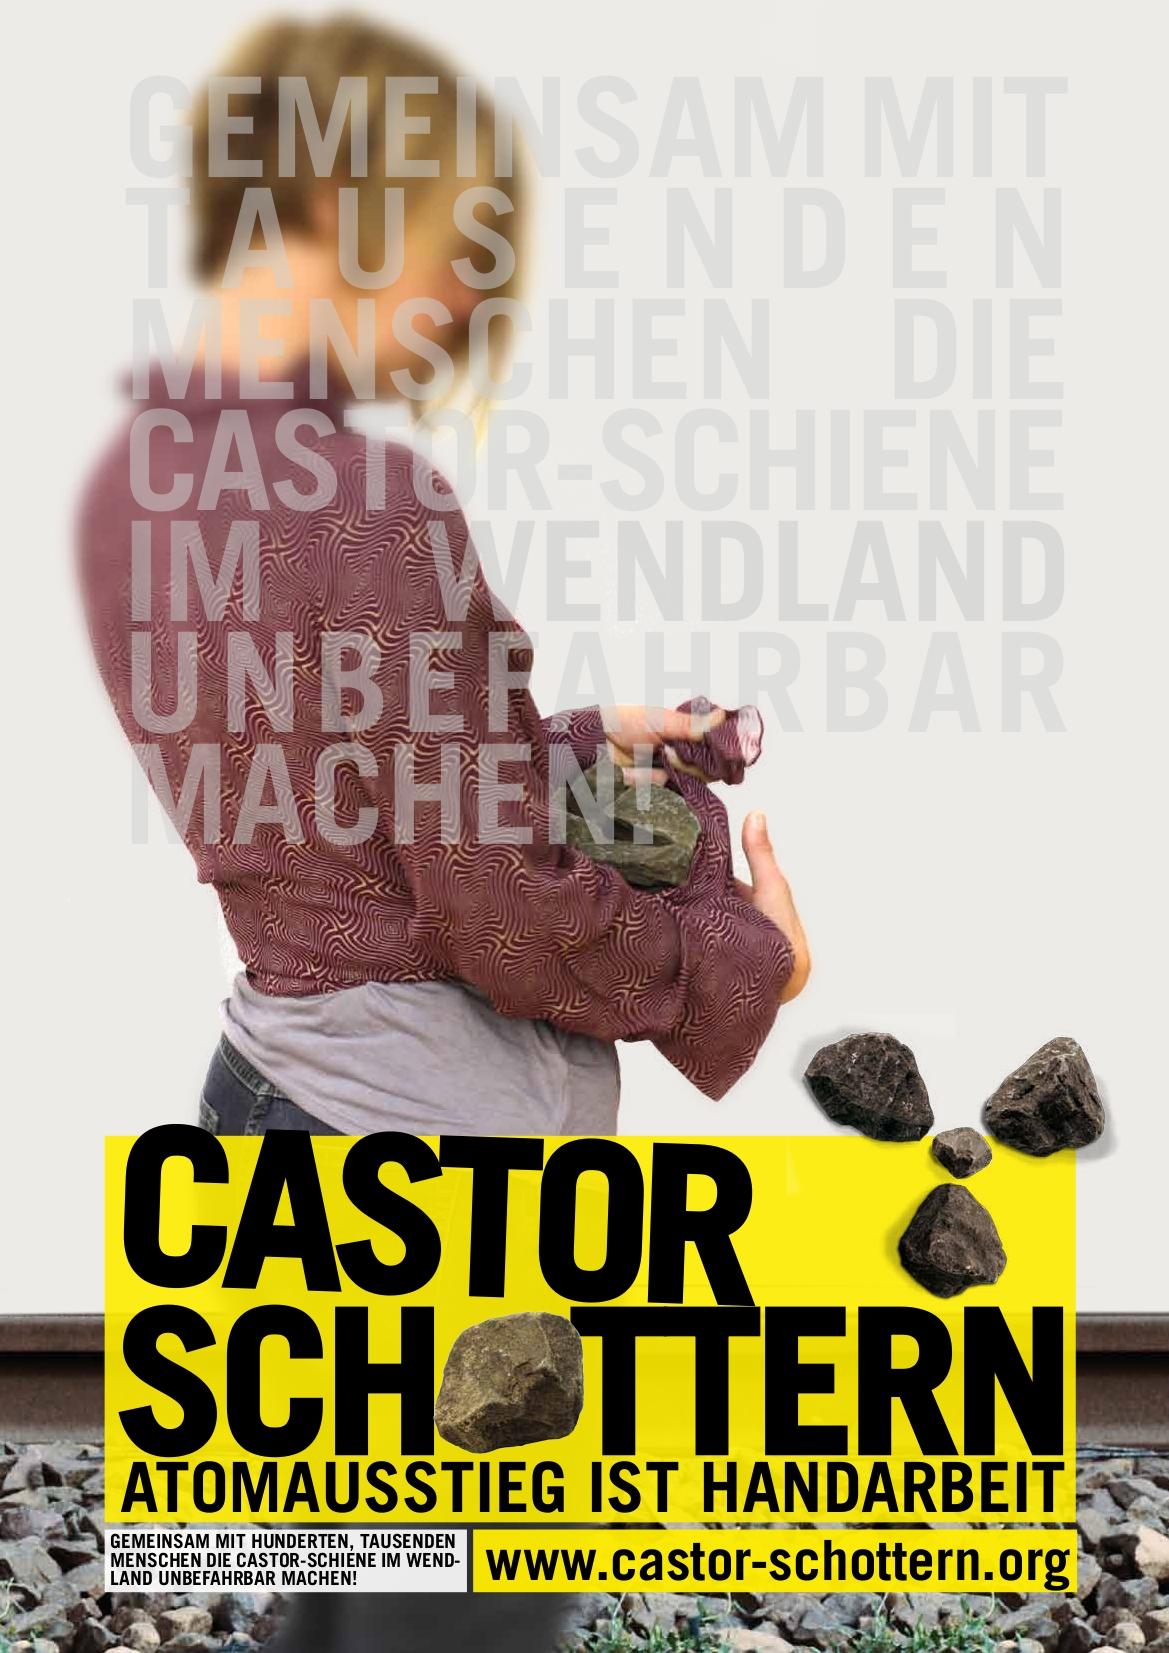 November 2010 � Castor schottern!